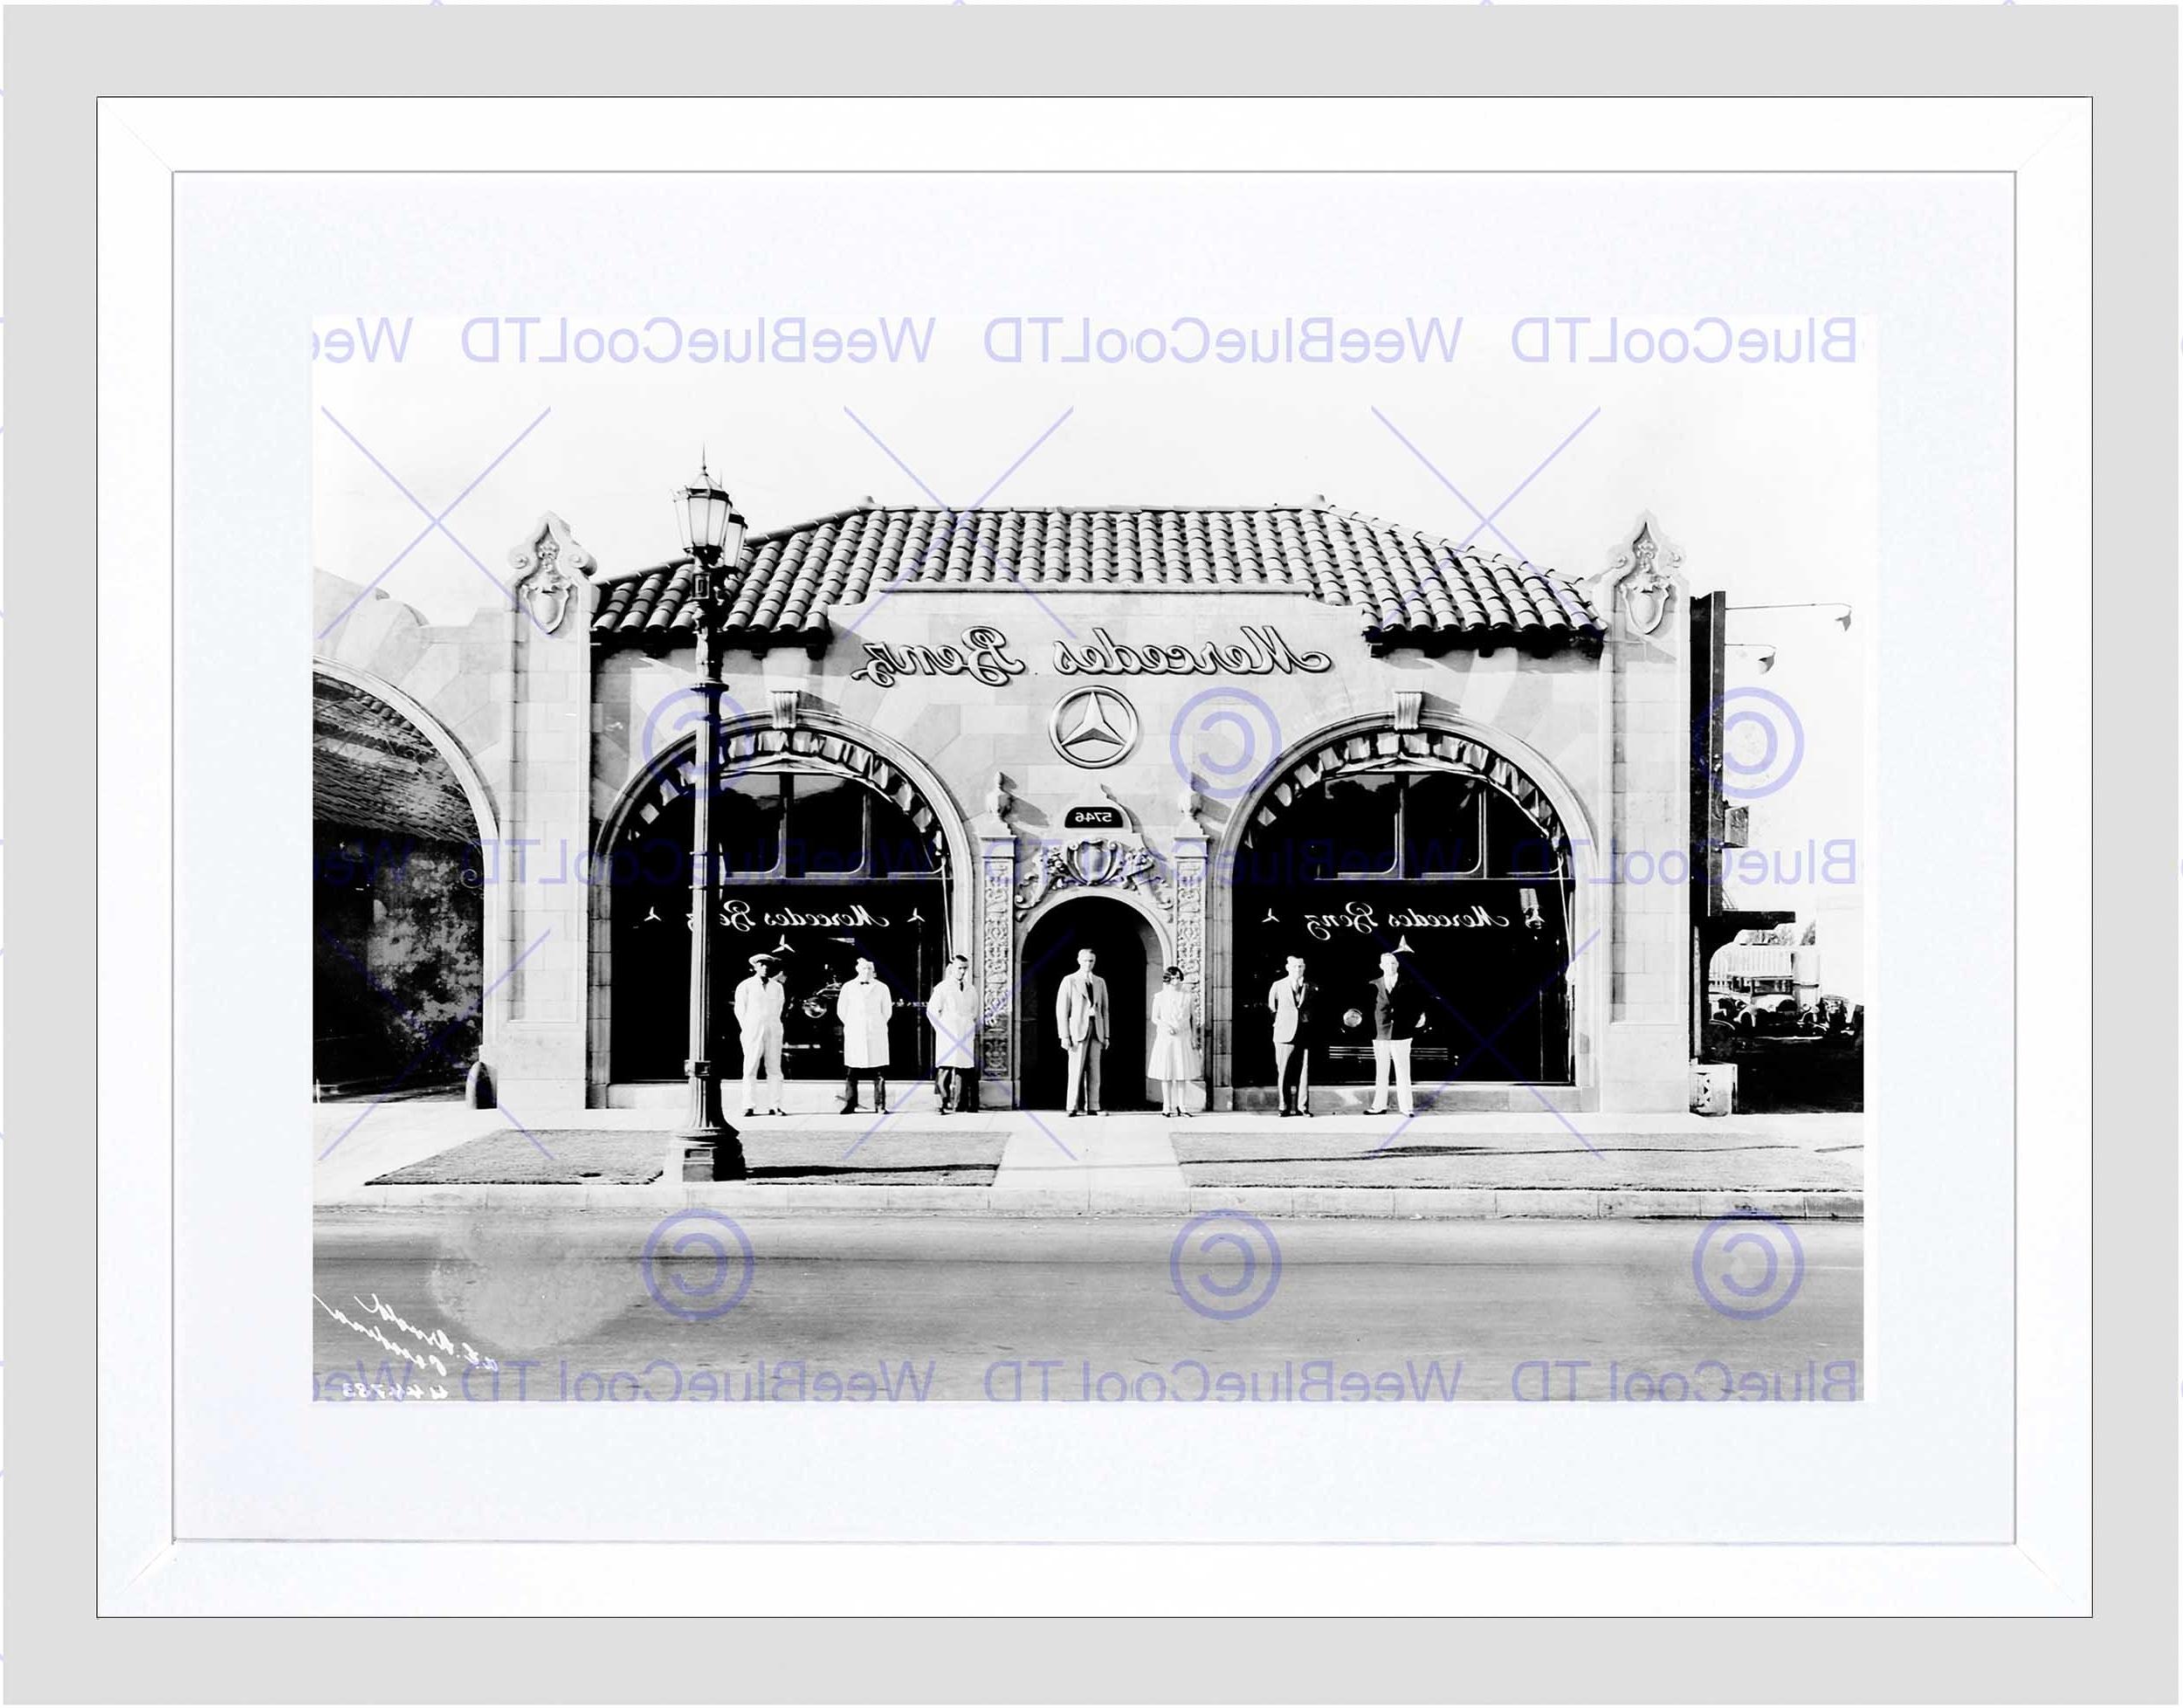 Vintage Car Automobile Sale Shop Pasadena Los Angeles Framed Art Within Trendy Los Angeles Framed Art Prints (Gallery 11 of 15)